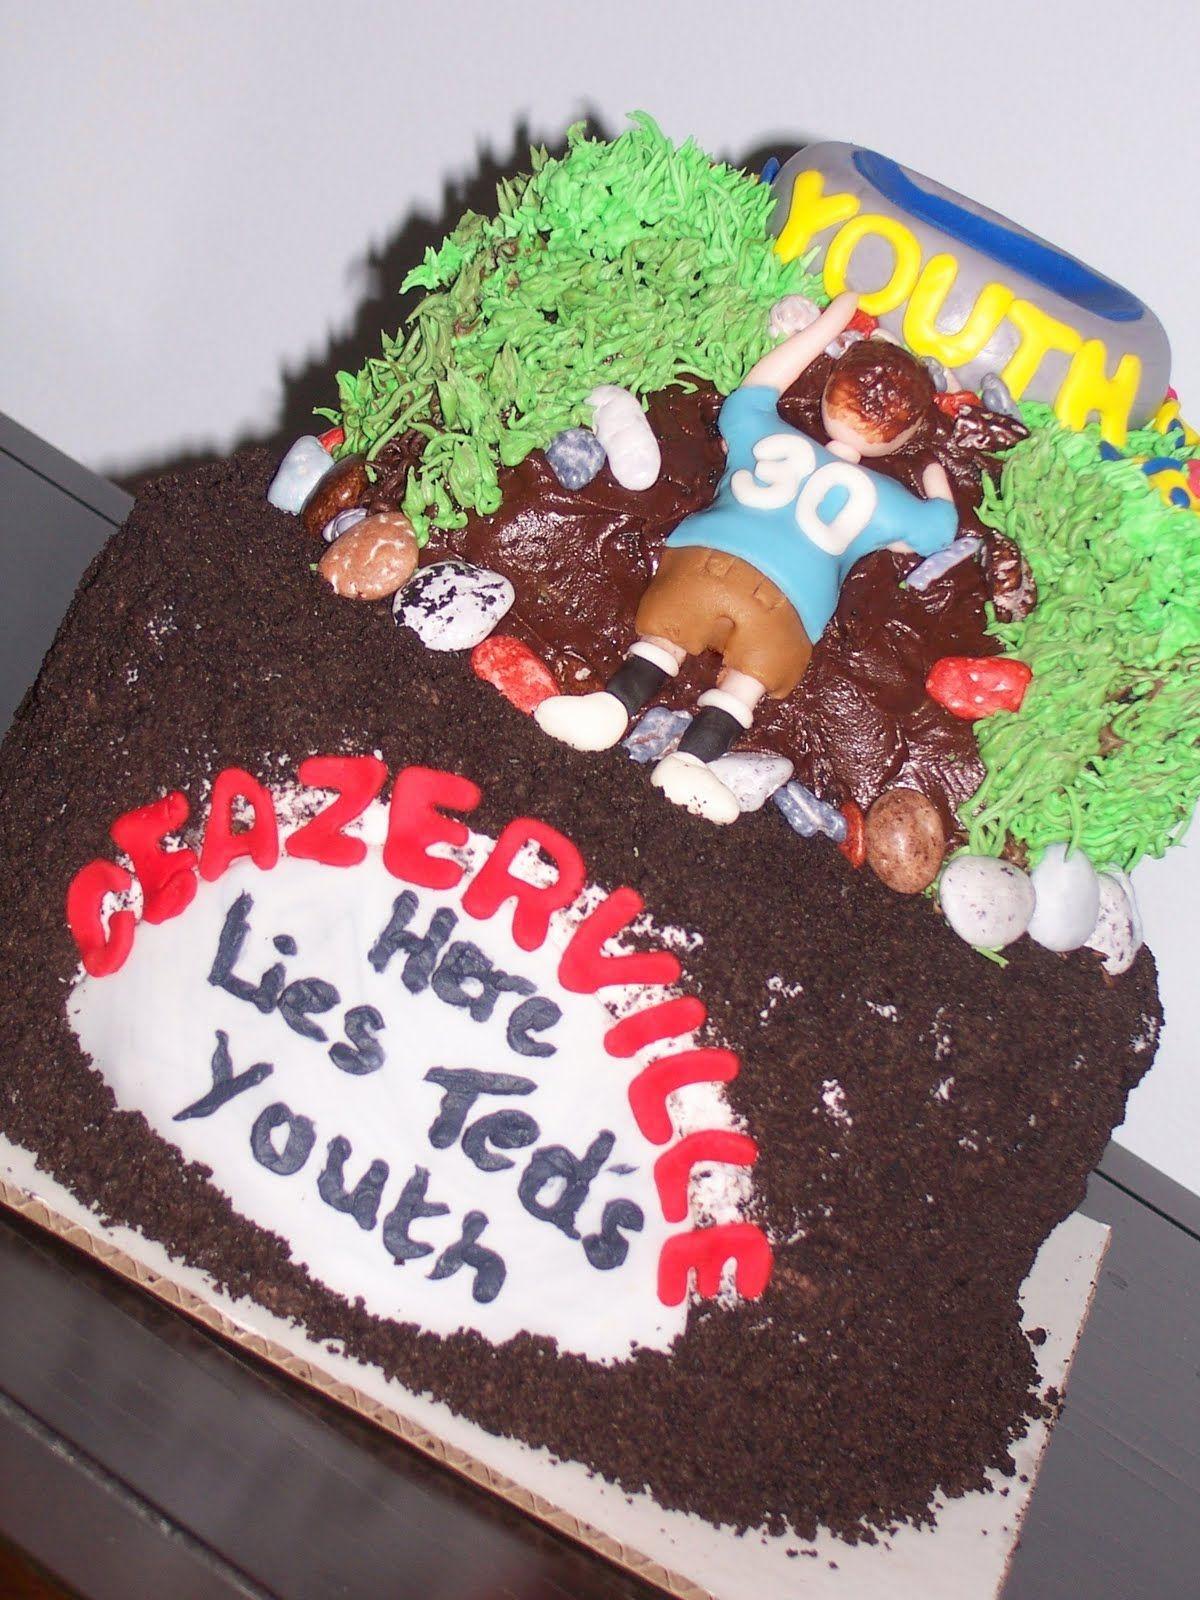 Humorous 30th Birthday Cake 30th Birthday Cake Idea For